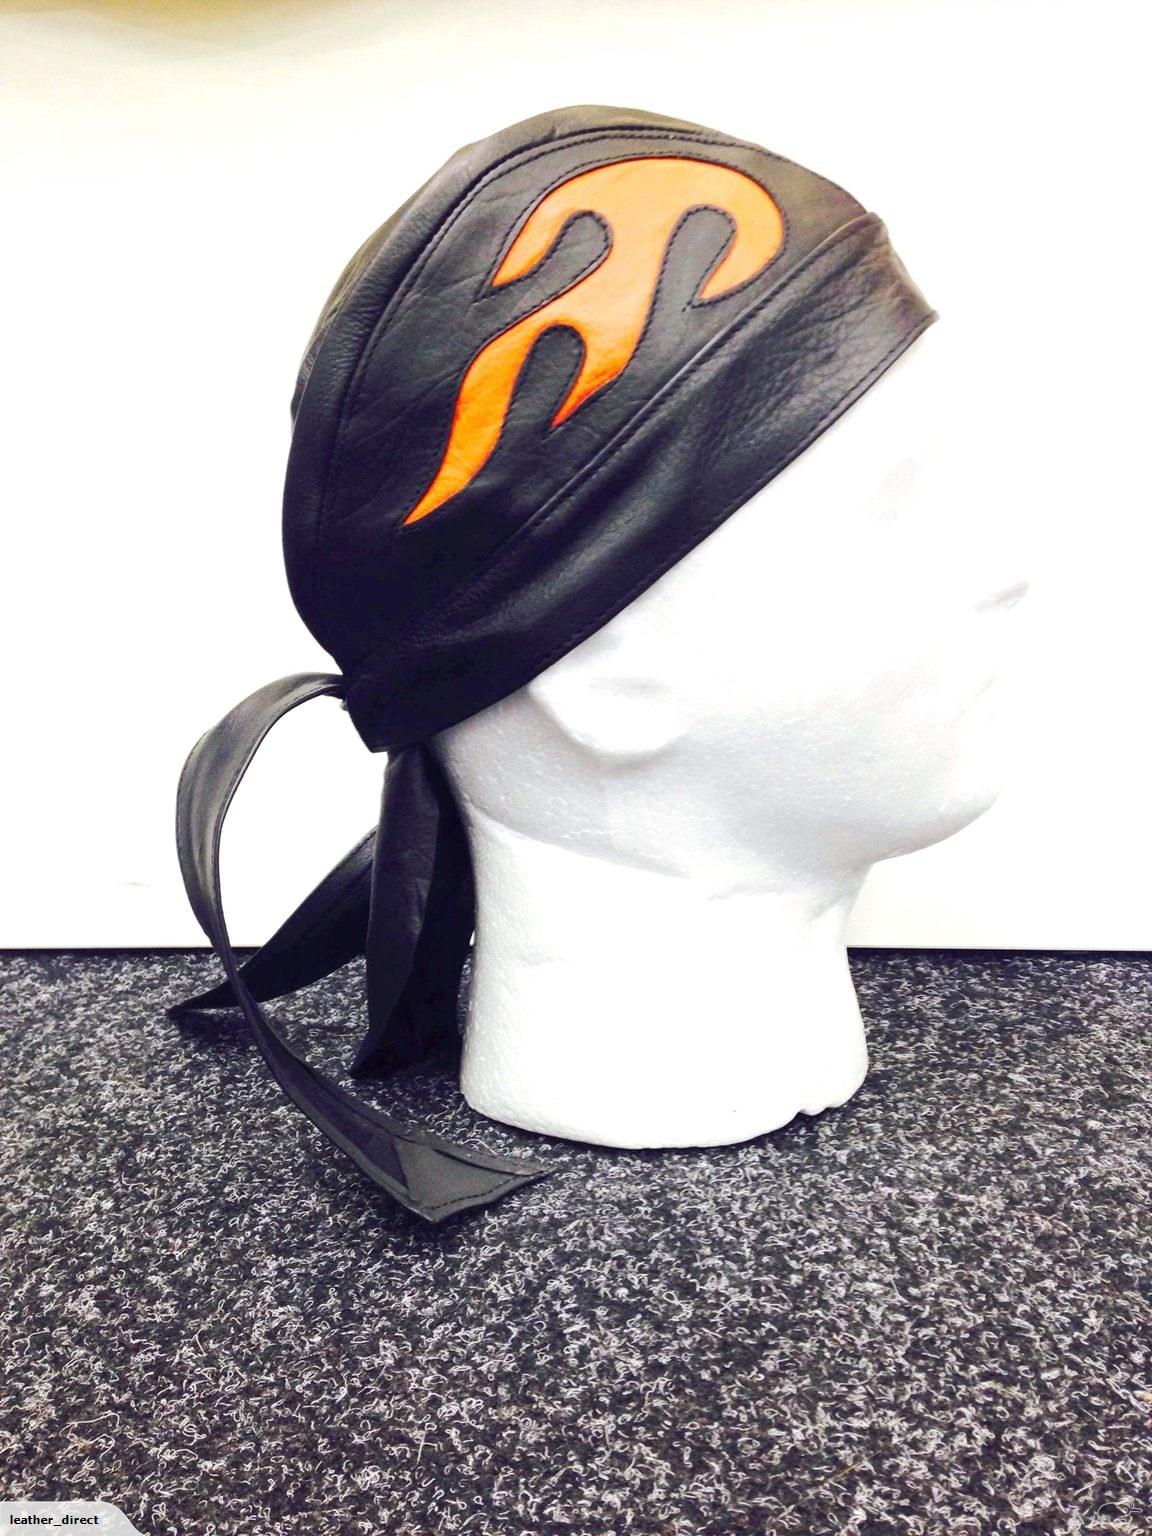 Best motorcycle gloves nz -  Leather Bandana Flydana With Orange Flame Design 29 90